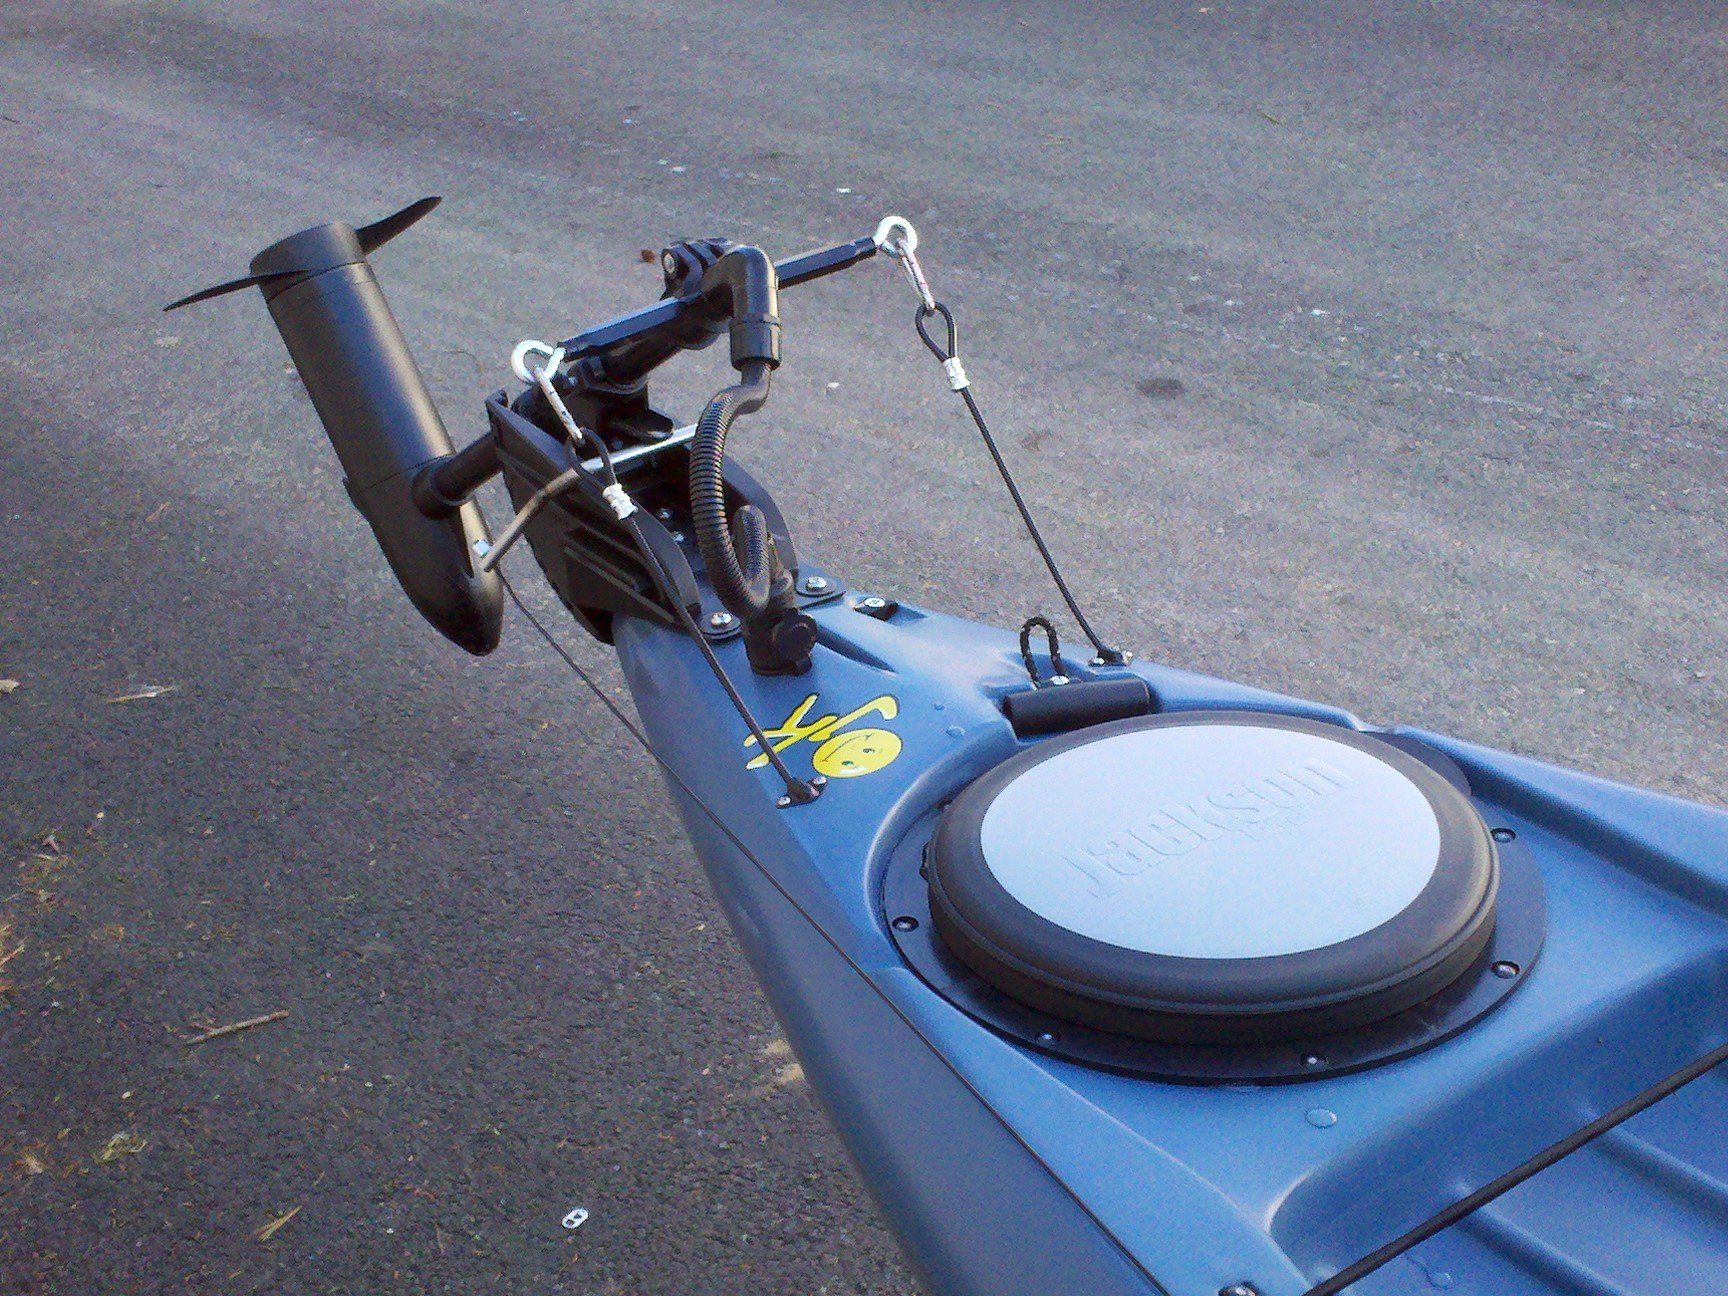 Diy Kayak Trolling Motor Kits Motorcycle Review And